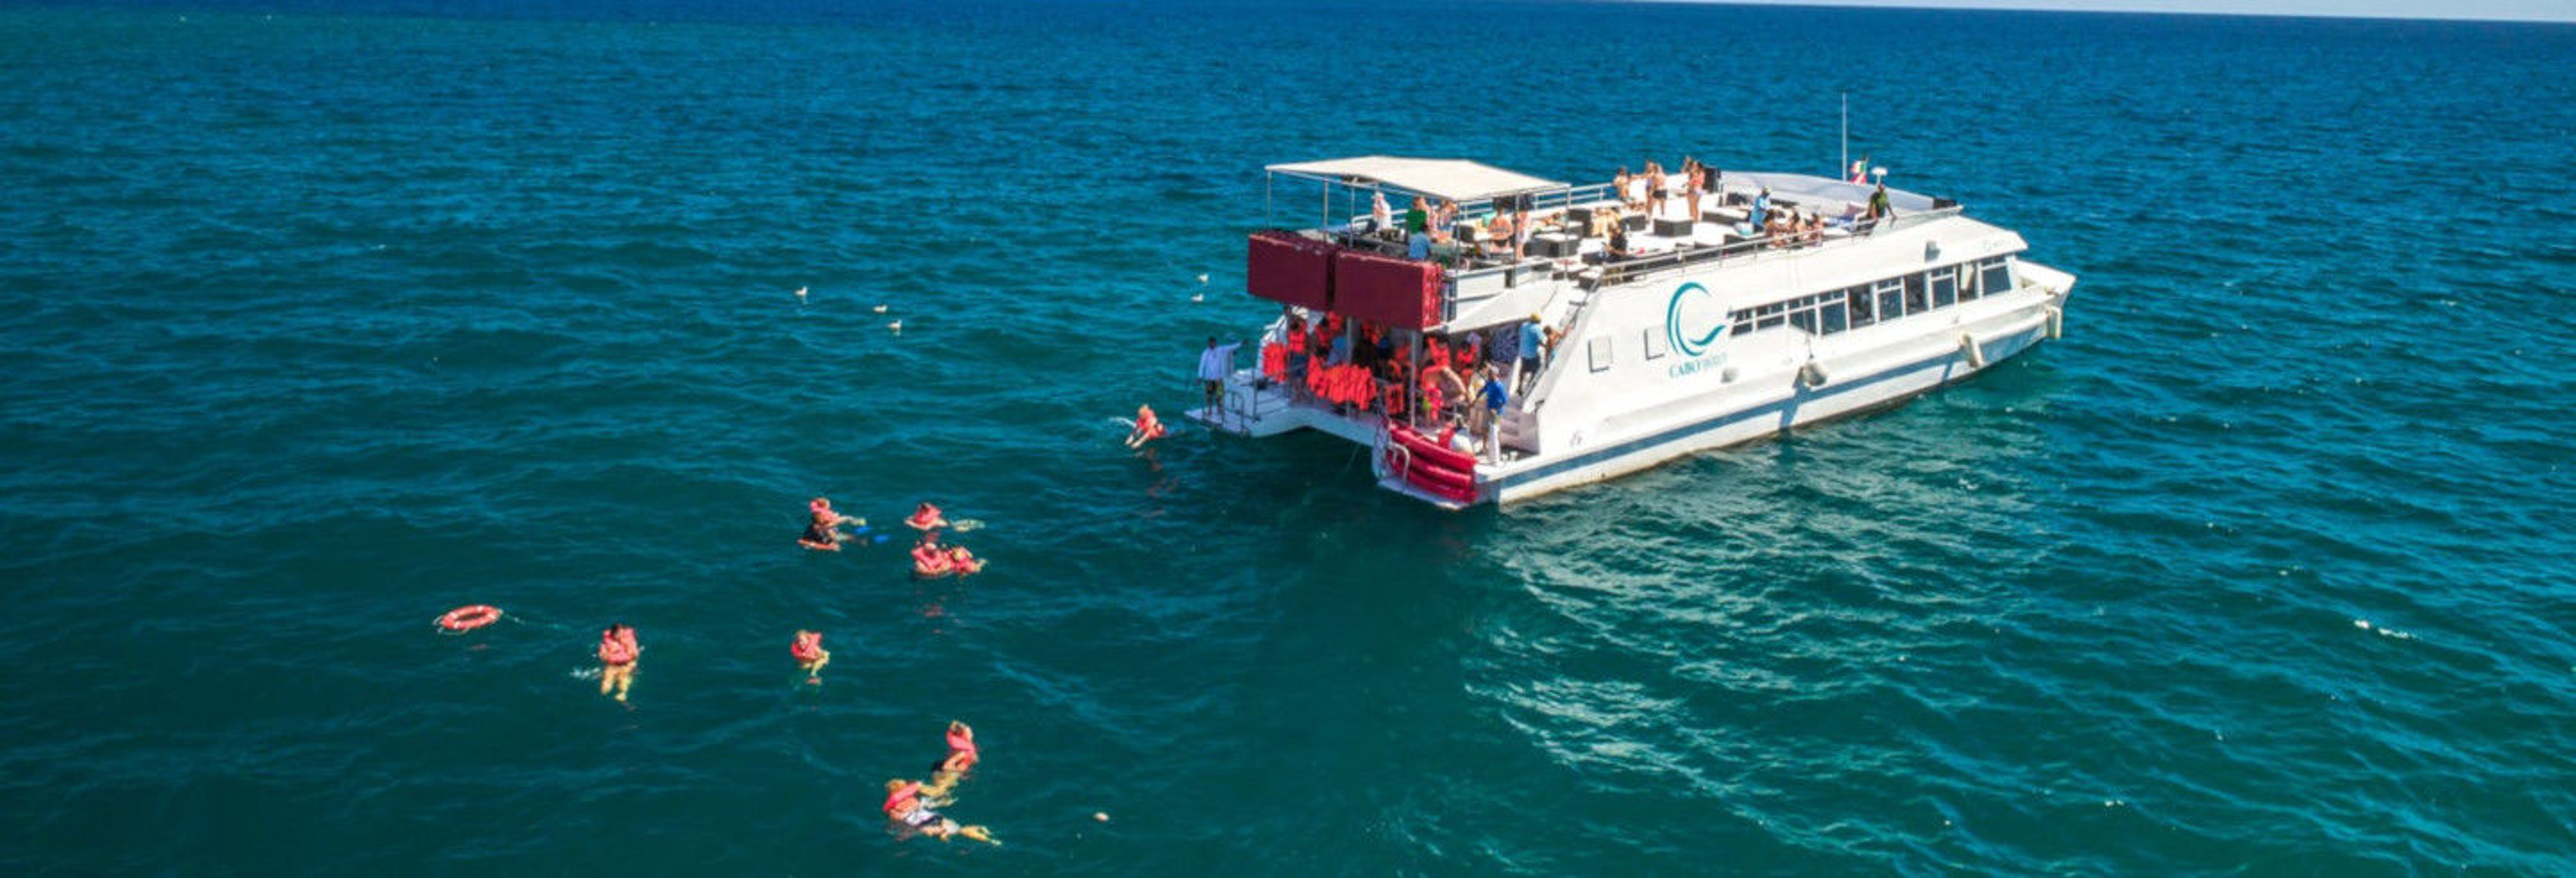 Giro in catamarano nel Golfo di California